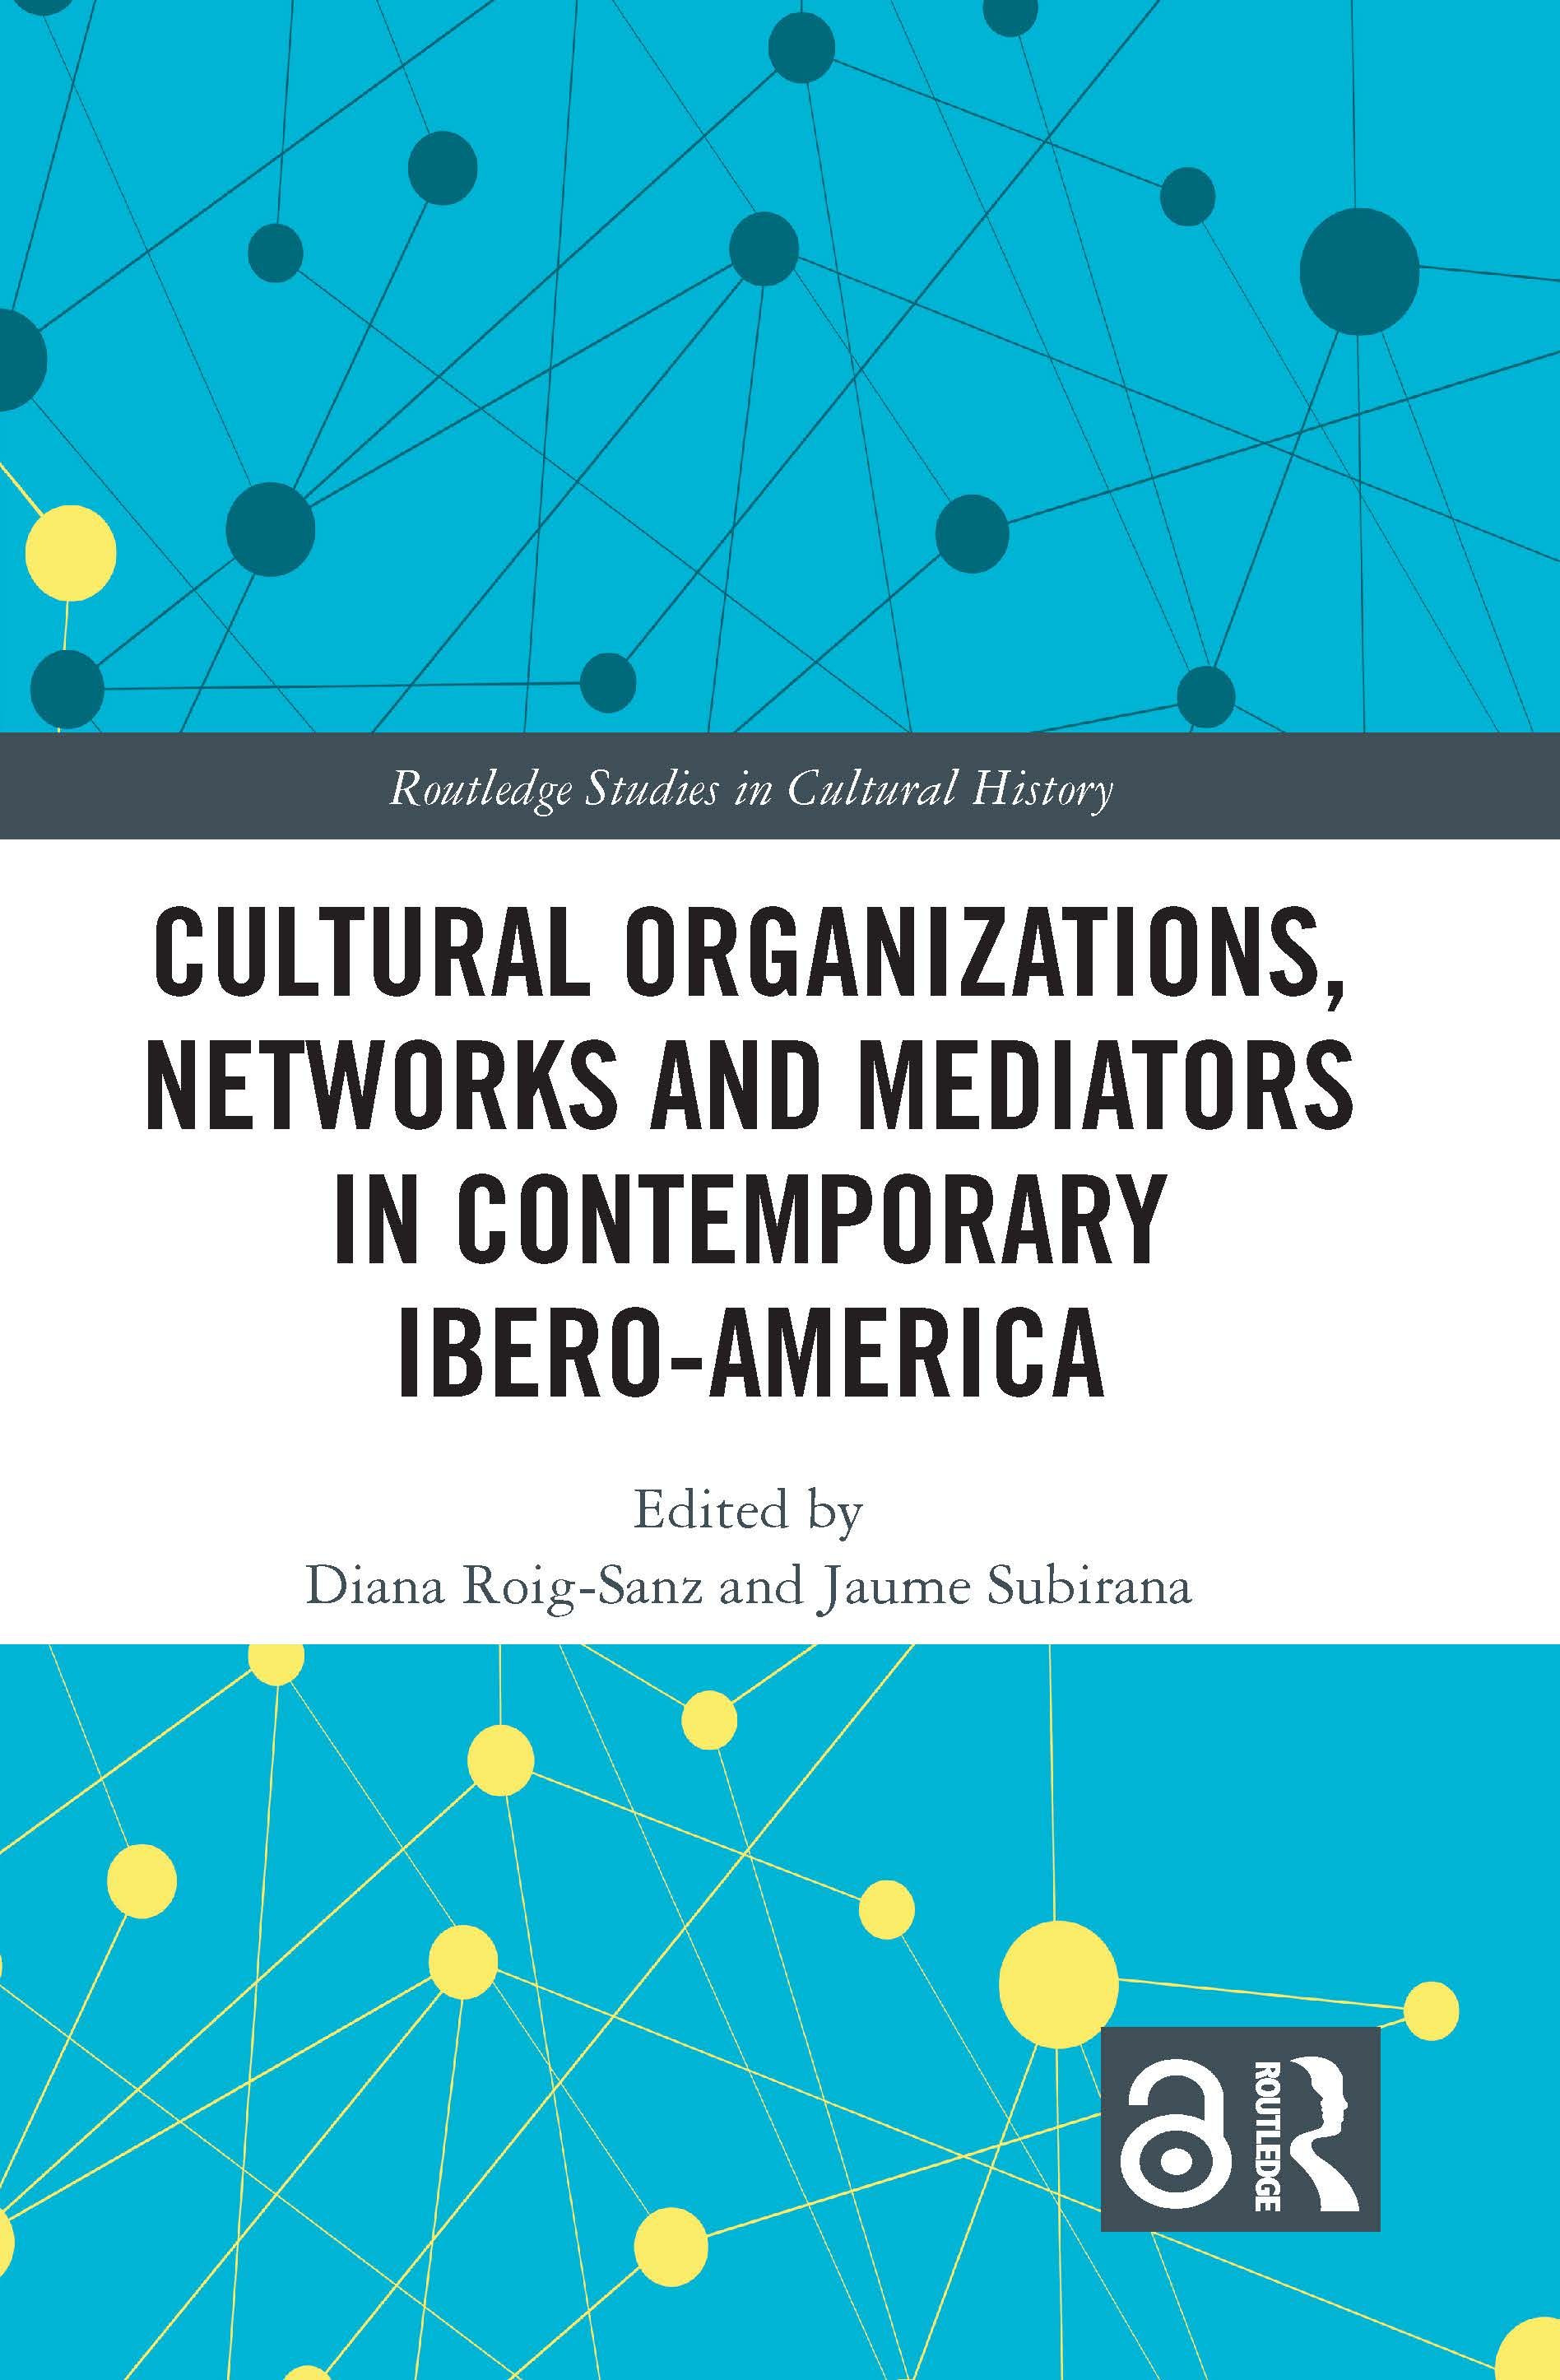 Cultural Organizations, Networks and Mediators in Contemporary Ibero-America book cover